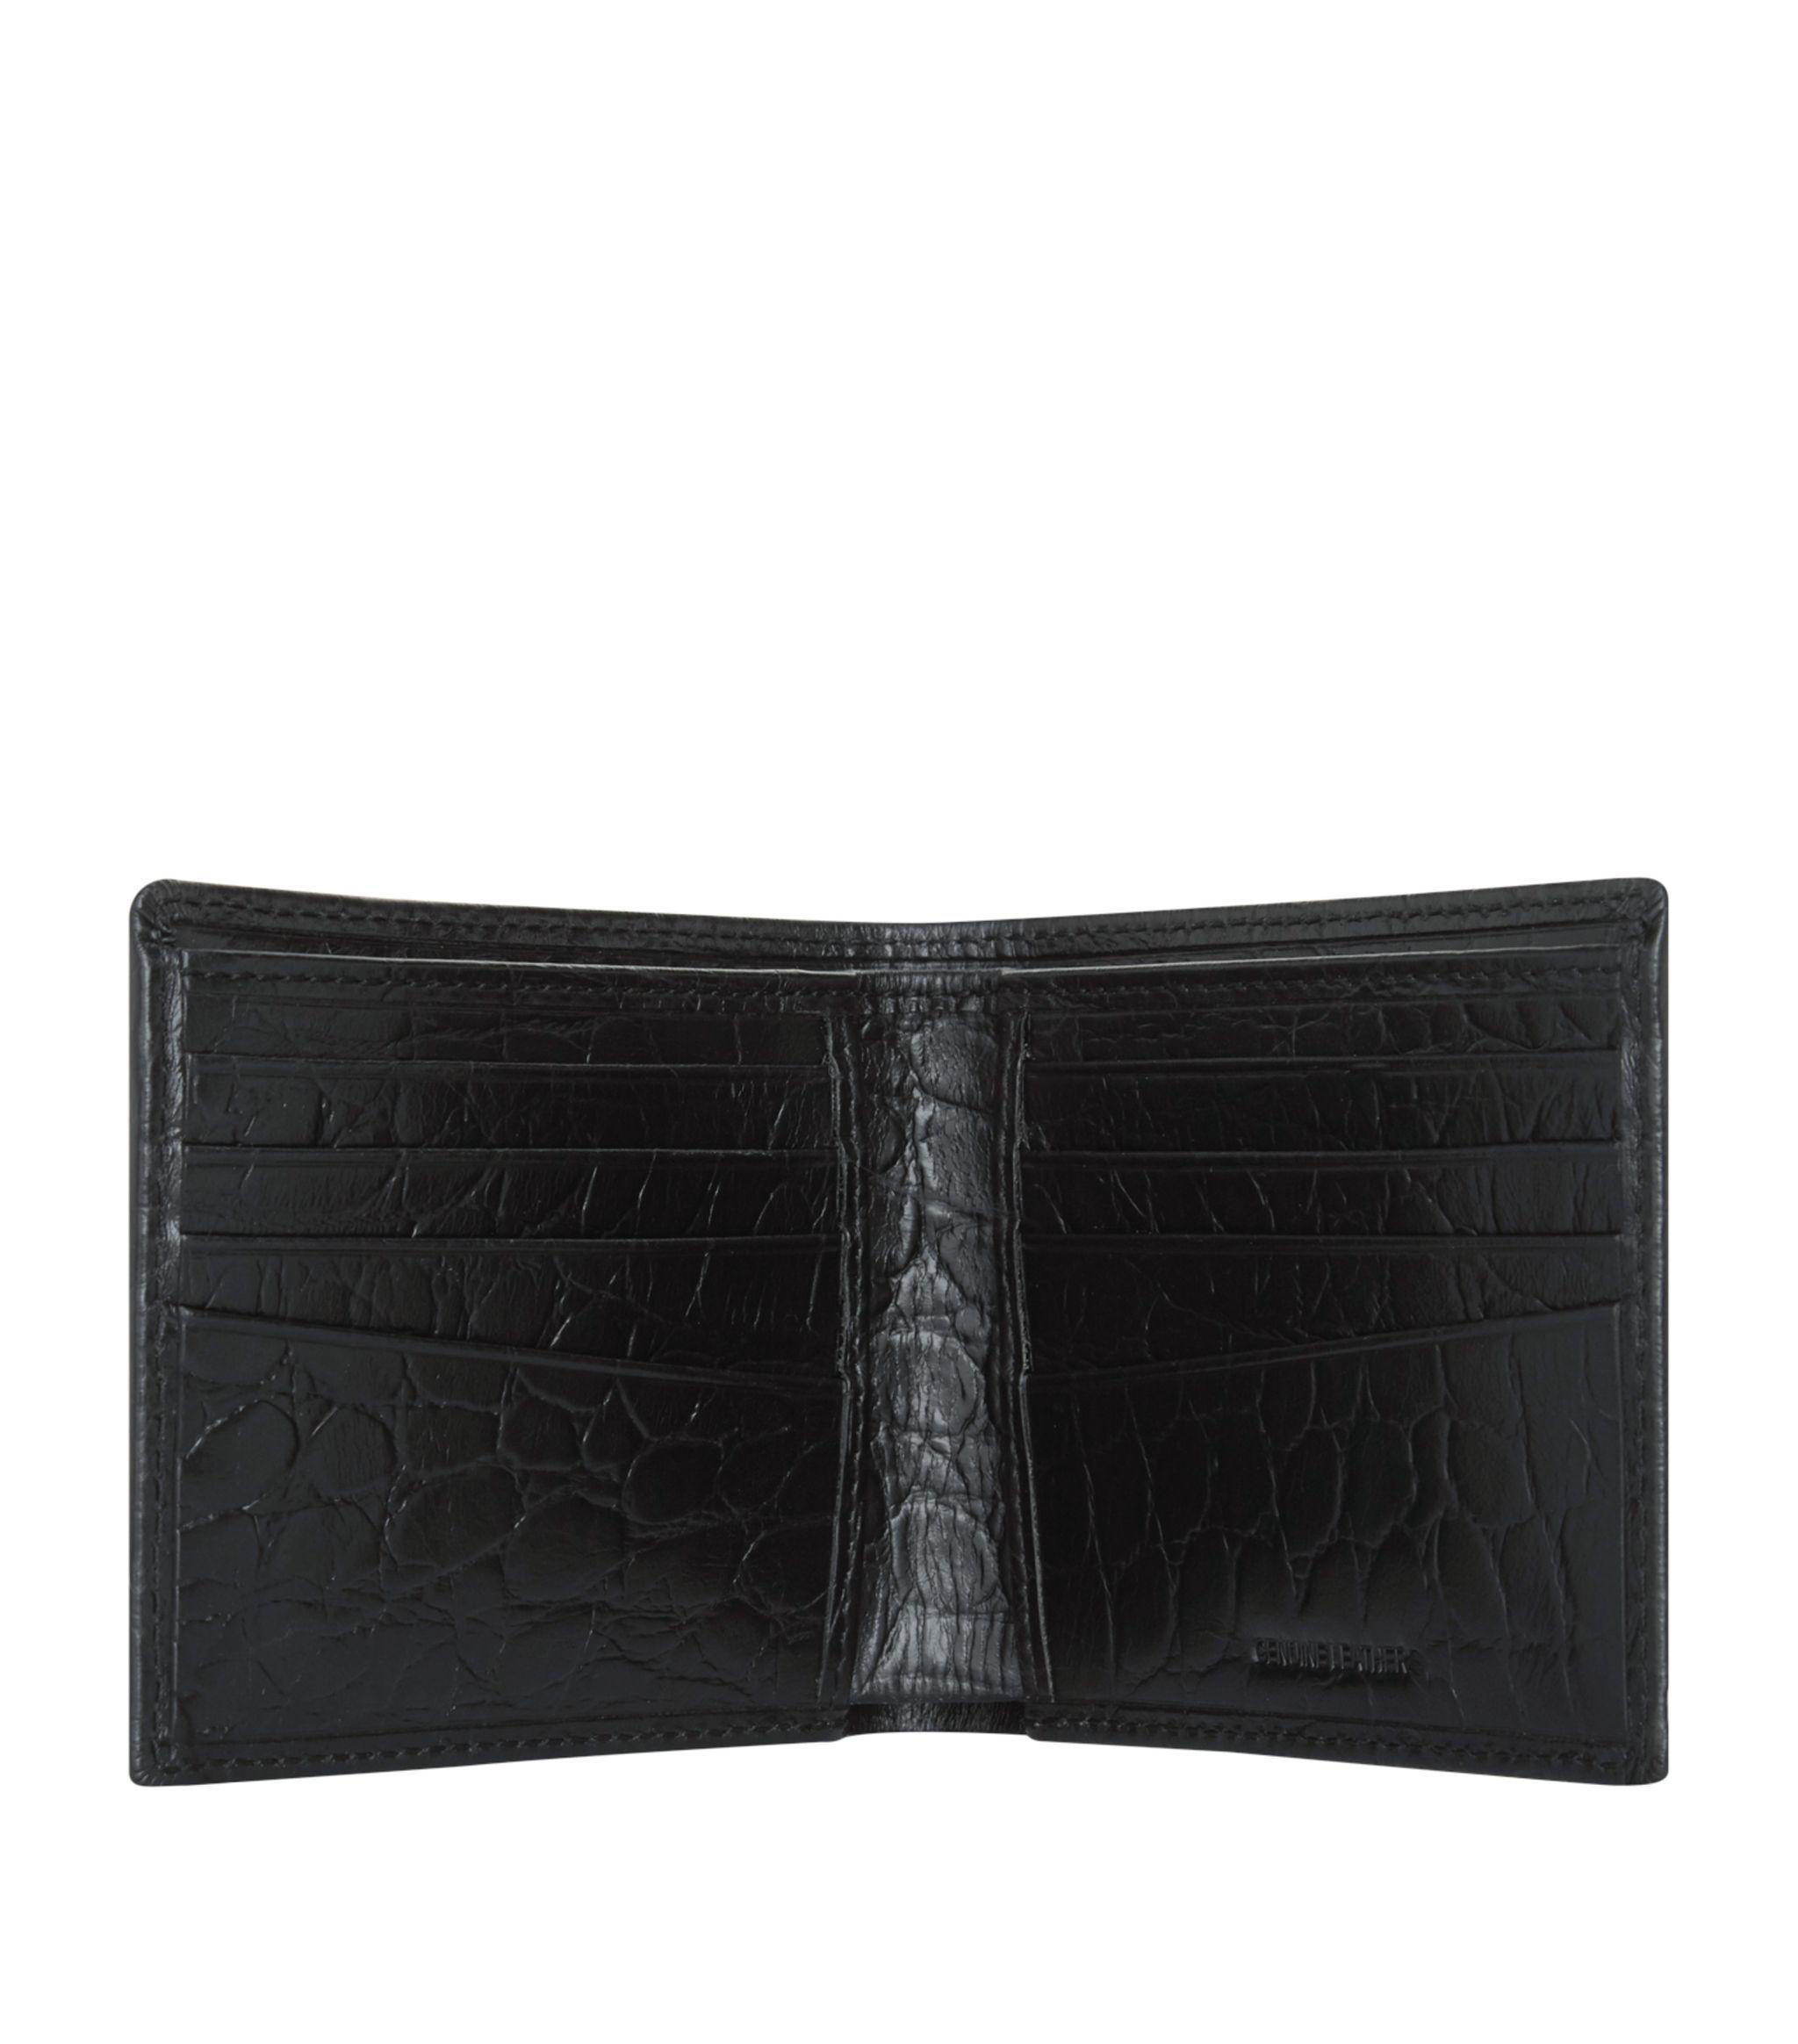 Harrods Black Crocodile Embossed Leather Bilfold Wallet Ad Sponsored Crocodile Black Harrods In 2020 Leather Bifold Wallet Bi Fold Wallet Embossed Leather